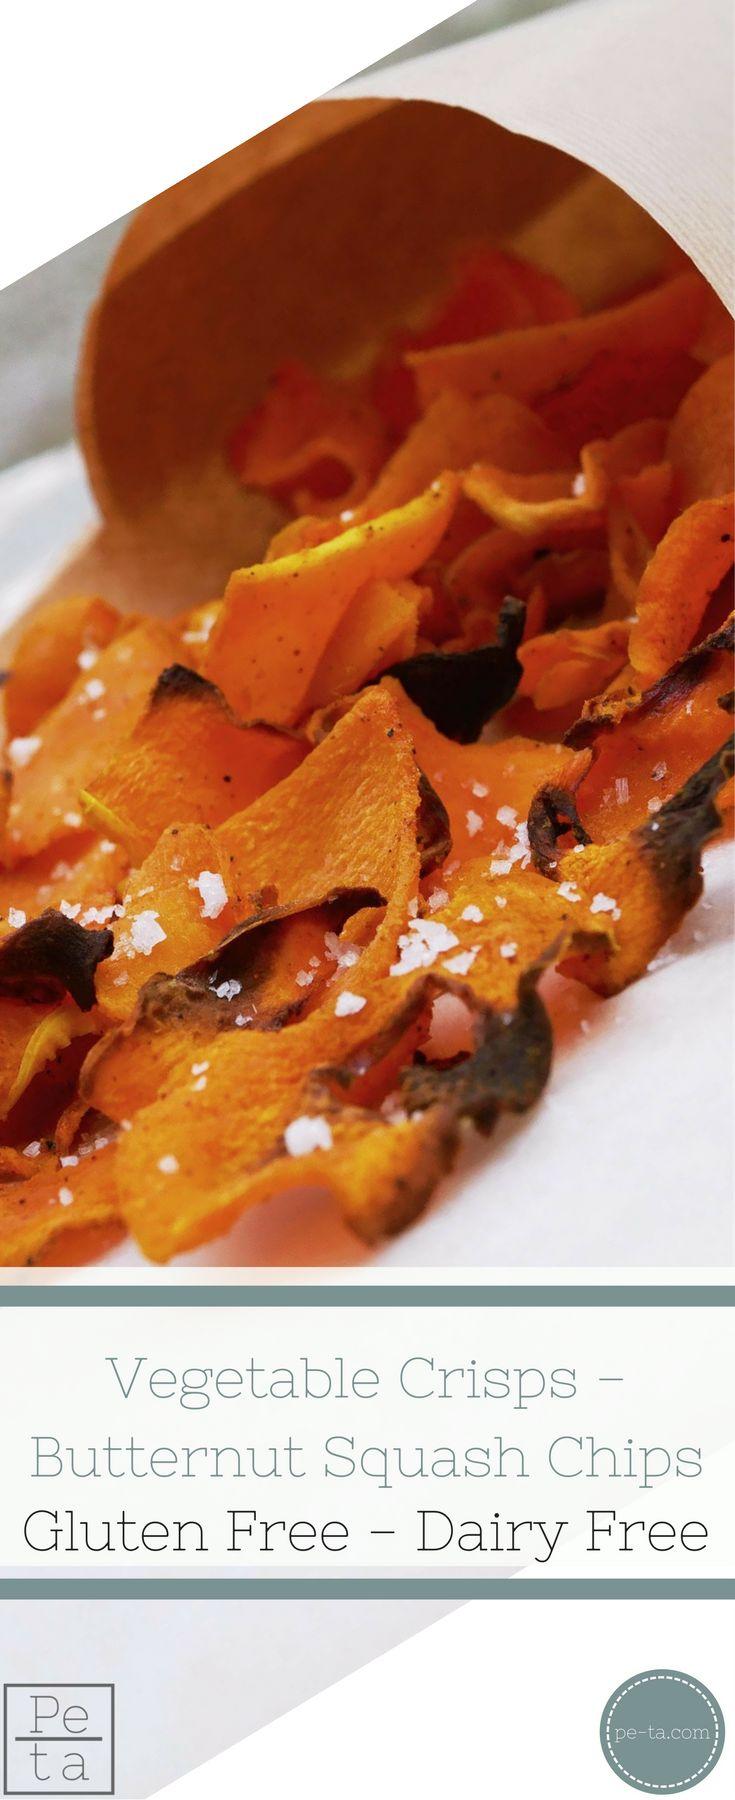 Butternut Squash Chips - Vegetable Crisps - Free From Dairy, Gluten & Refined Sugar